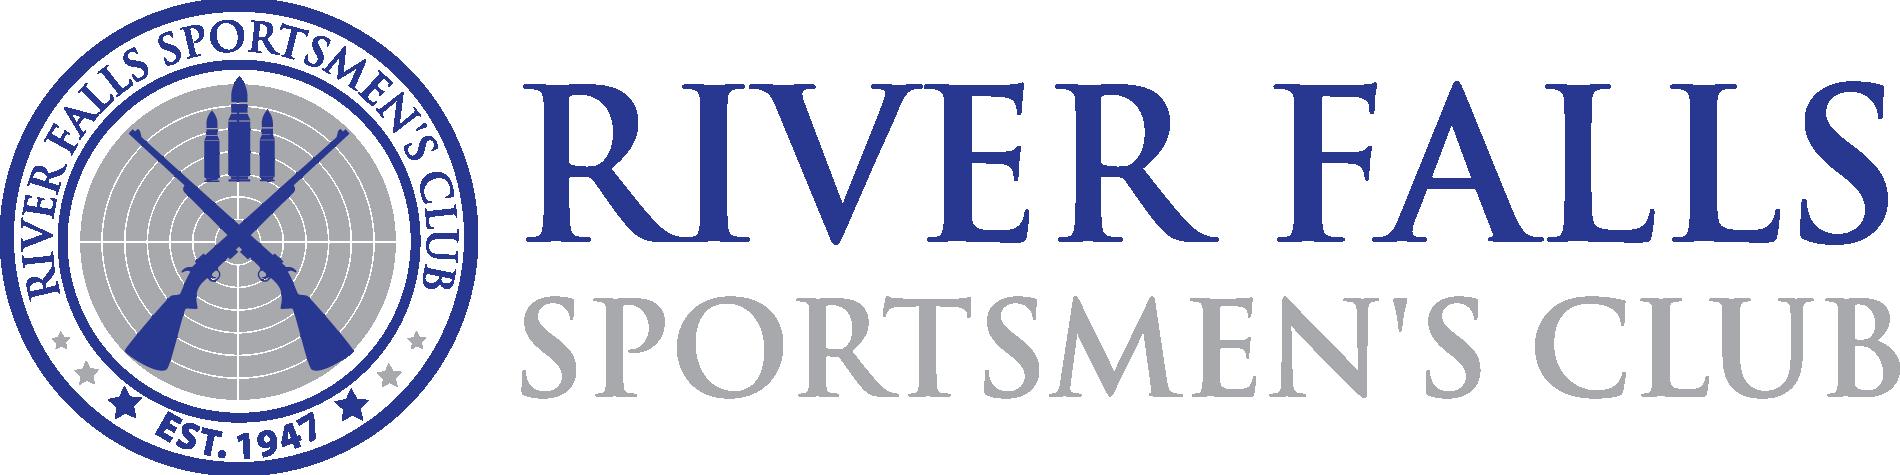 River Falls Sportsmen's Club